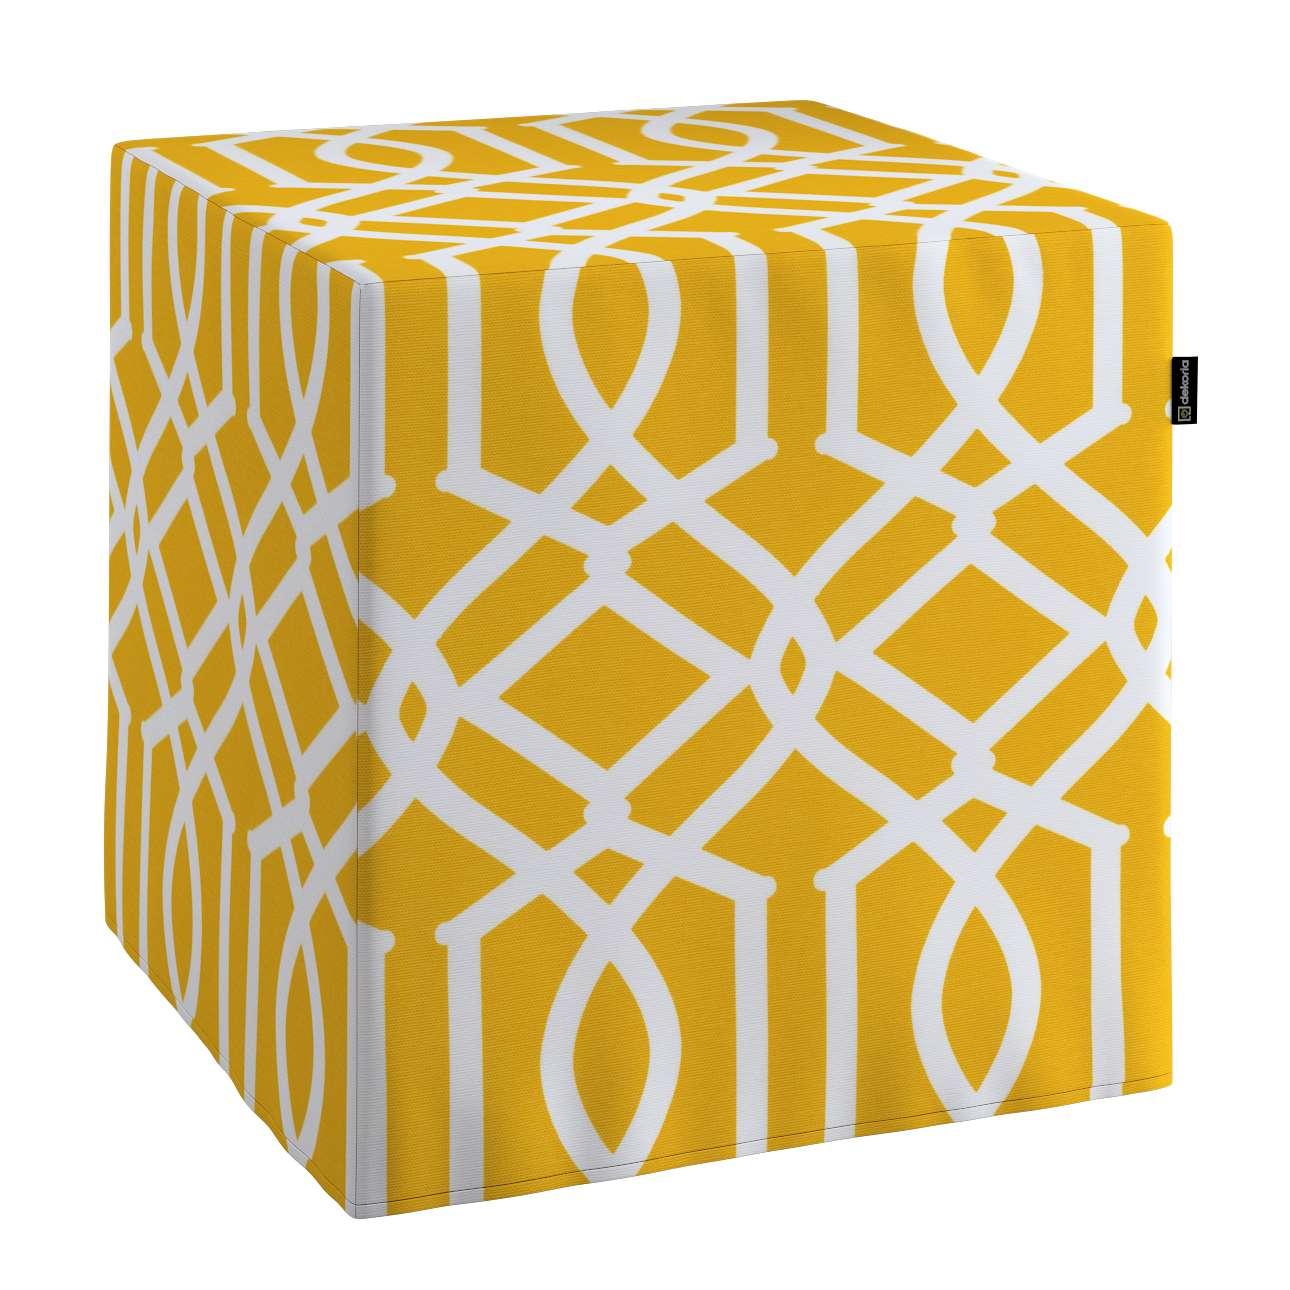 Sedák Cube - kostka pevná 40x40x40 v kolekci Comics, látka: 135-09